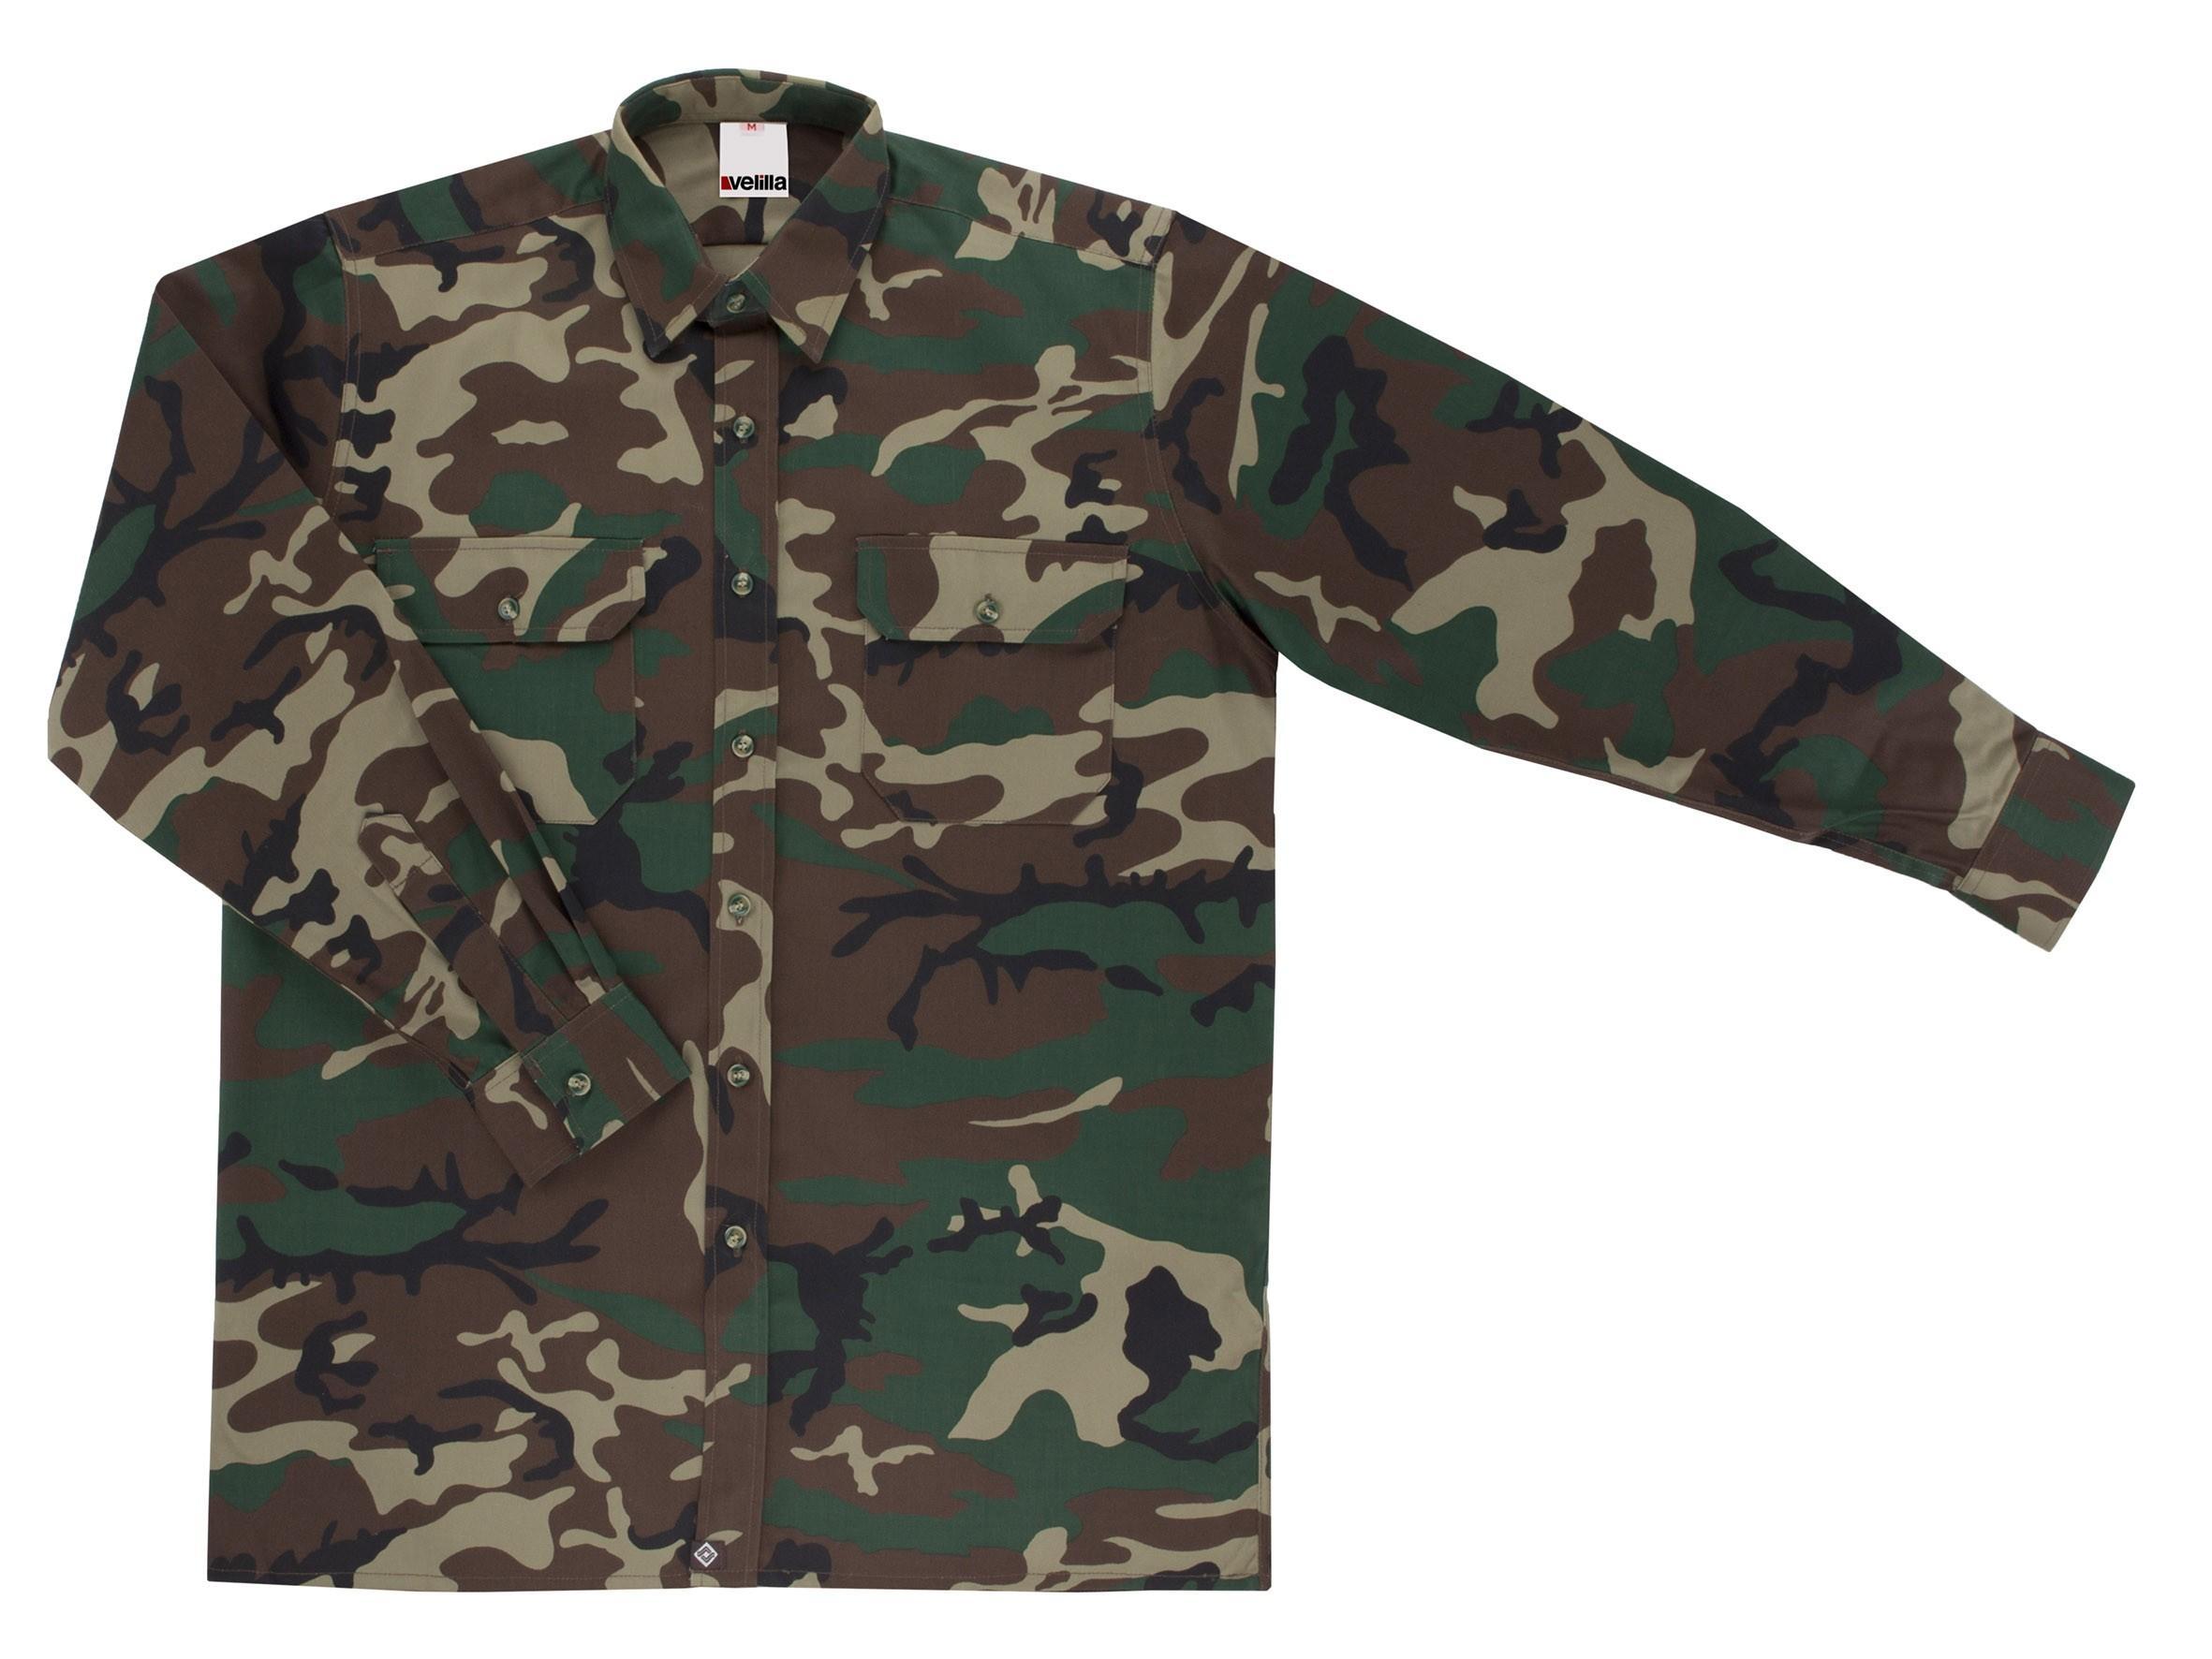 Foto Camisa 535 de manga larga. Camuflaje. Velilla